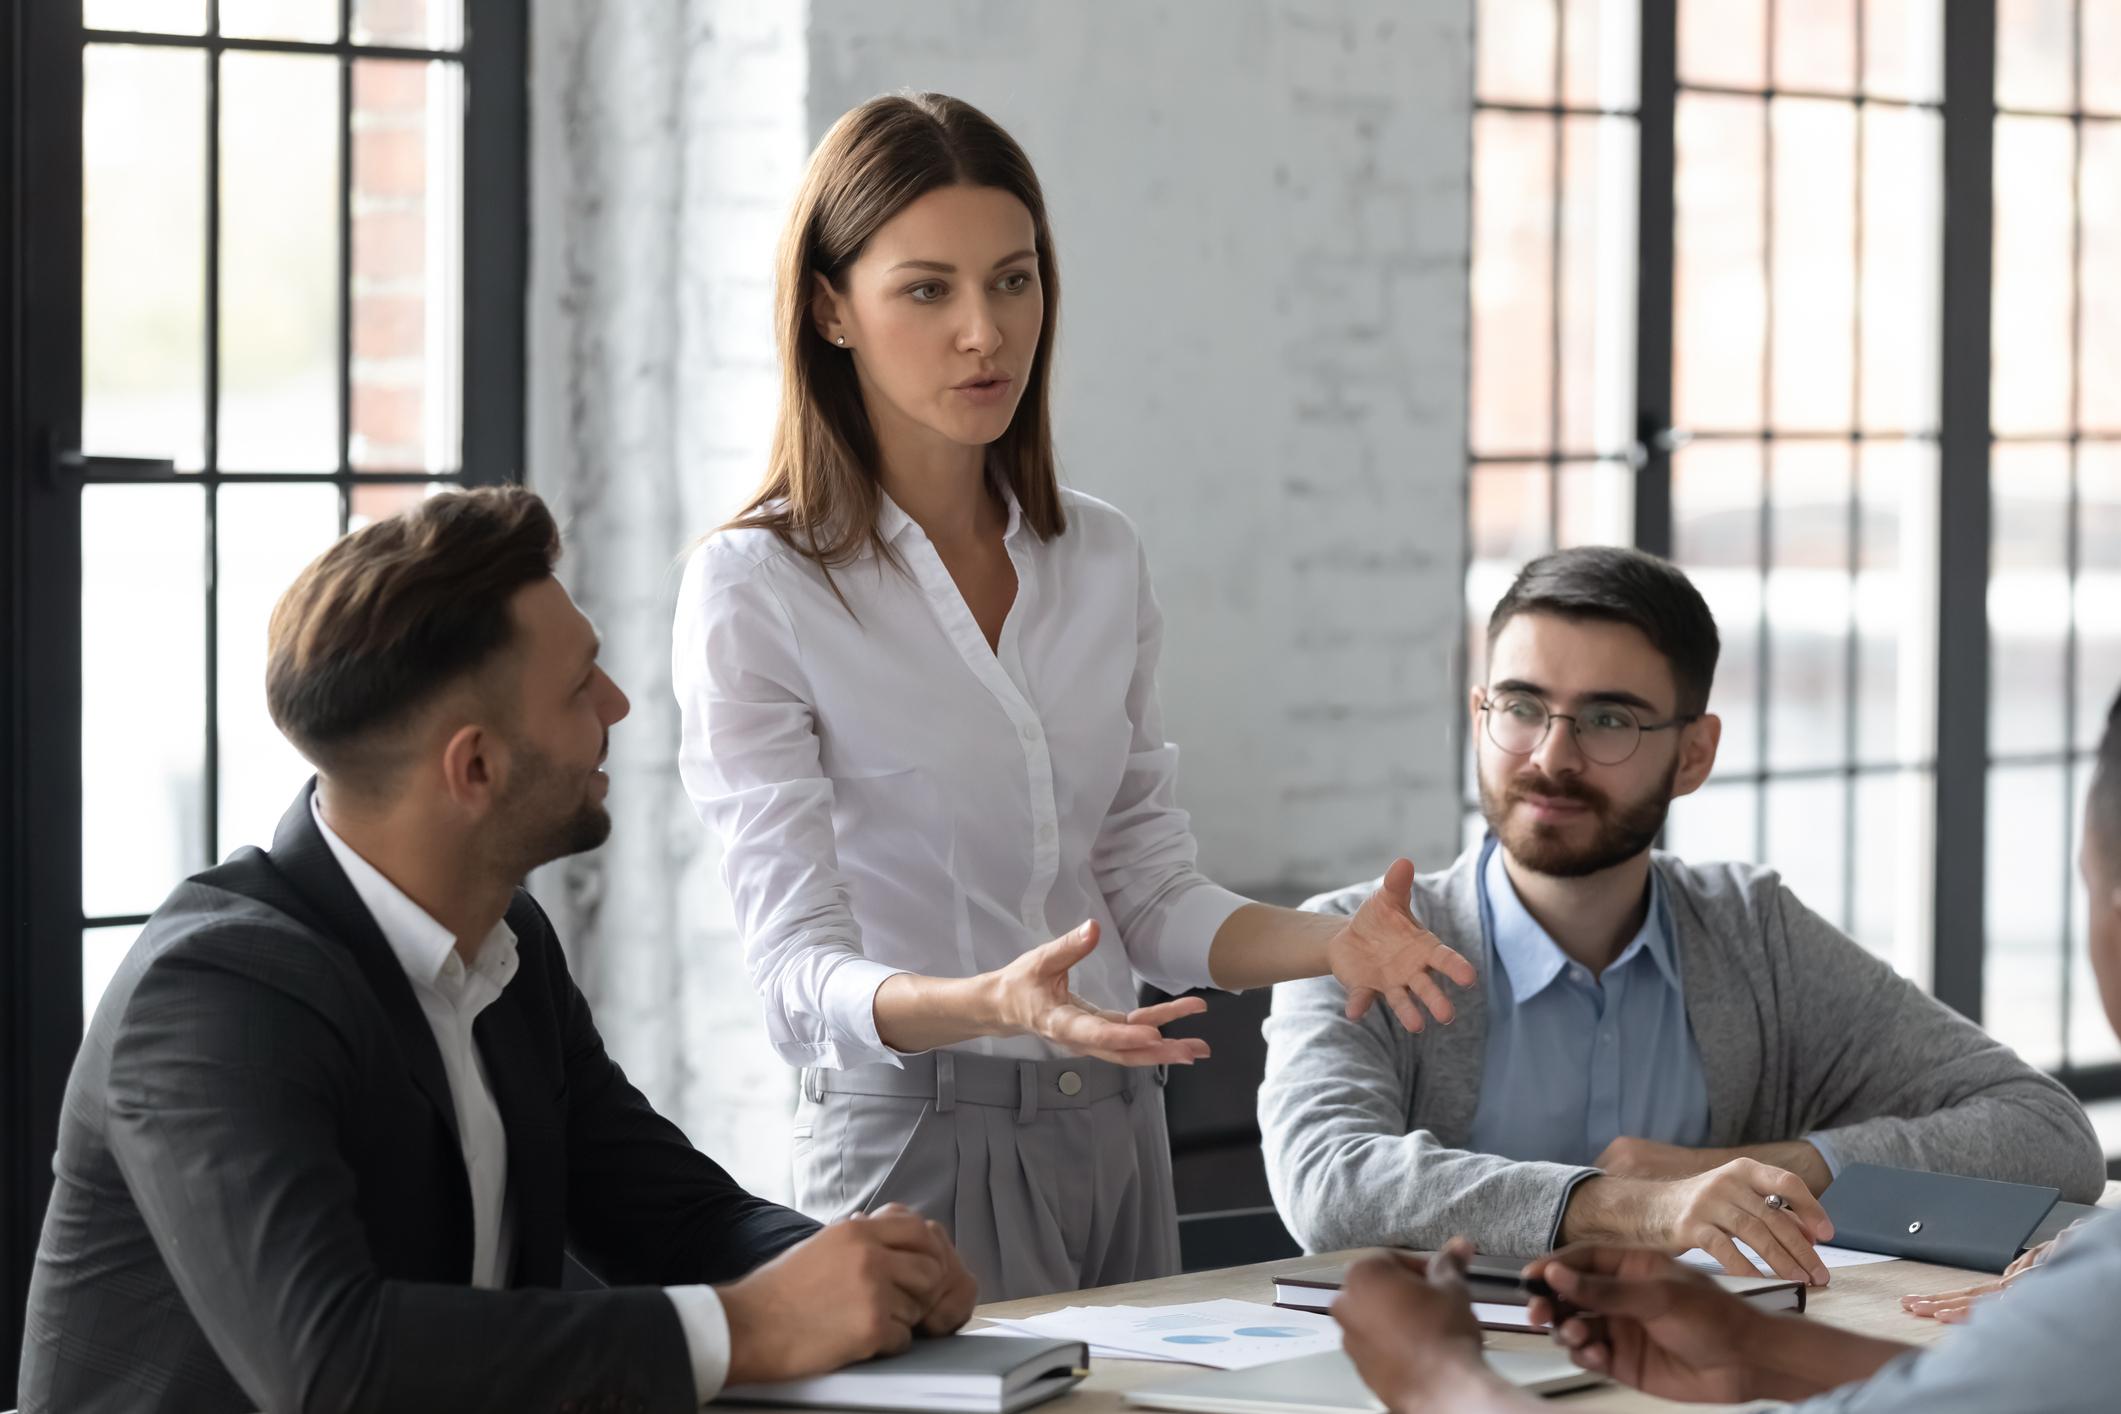 5 Ways to Avoid Leadership Failure